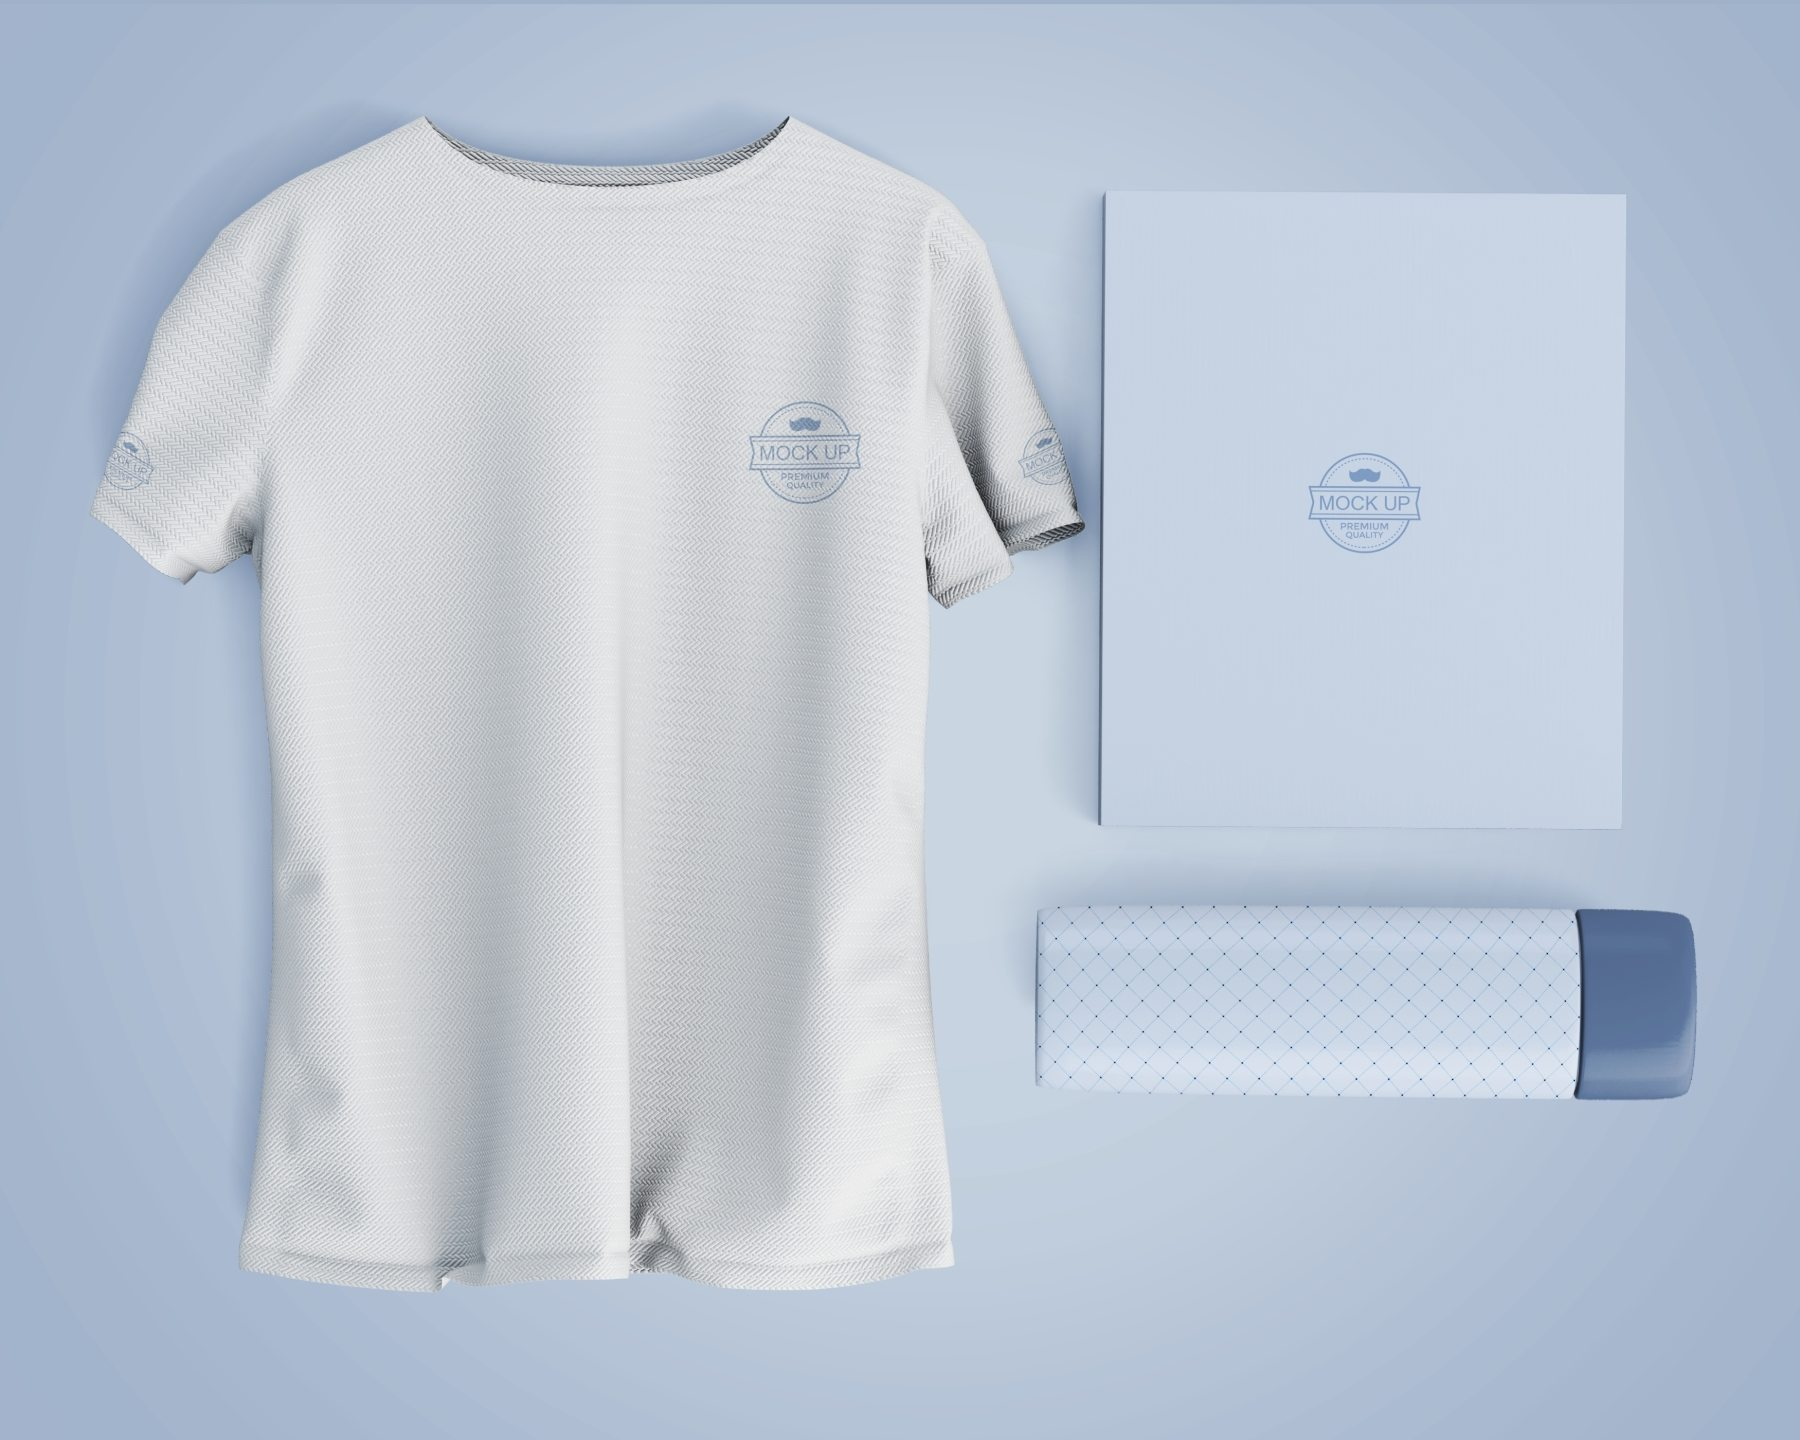 f40d7c01ff999ee - 潮流印花短袖T恤衣架悬挂上装样机